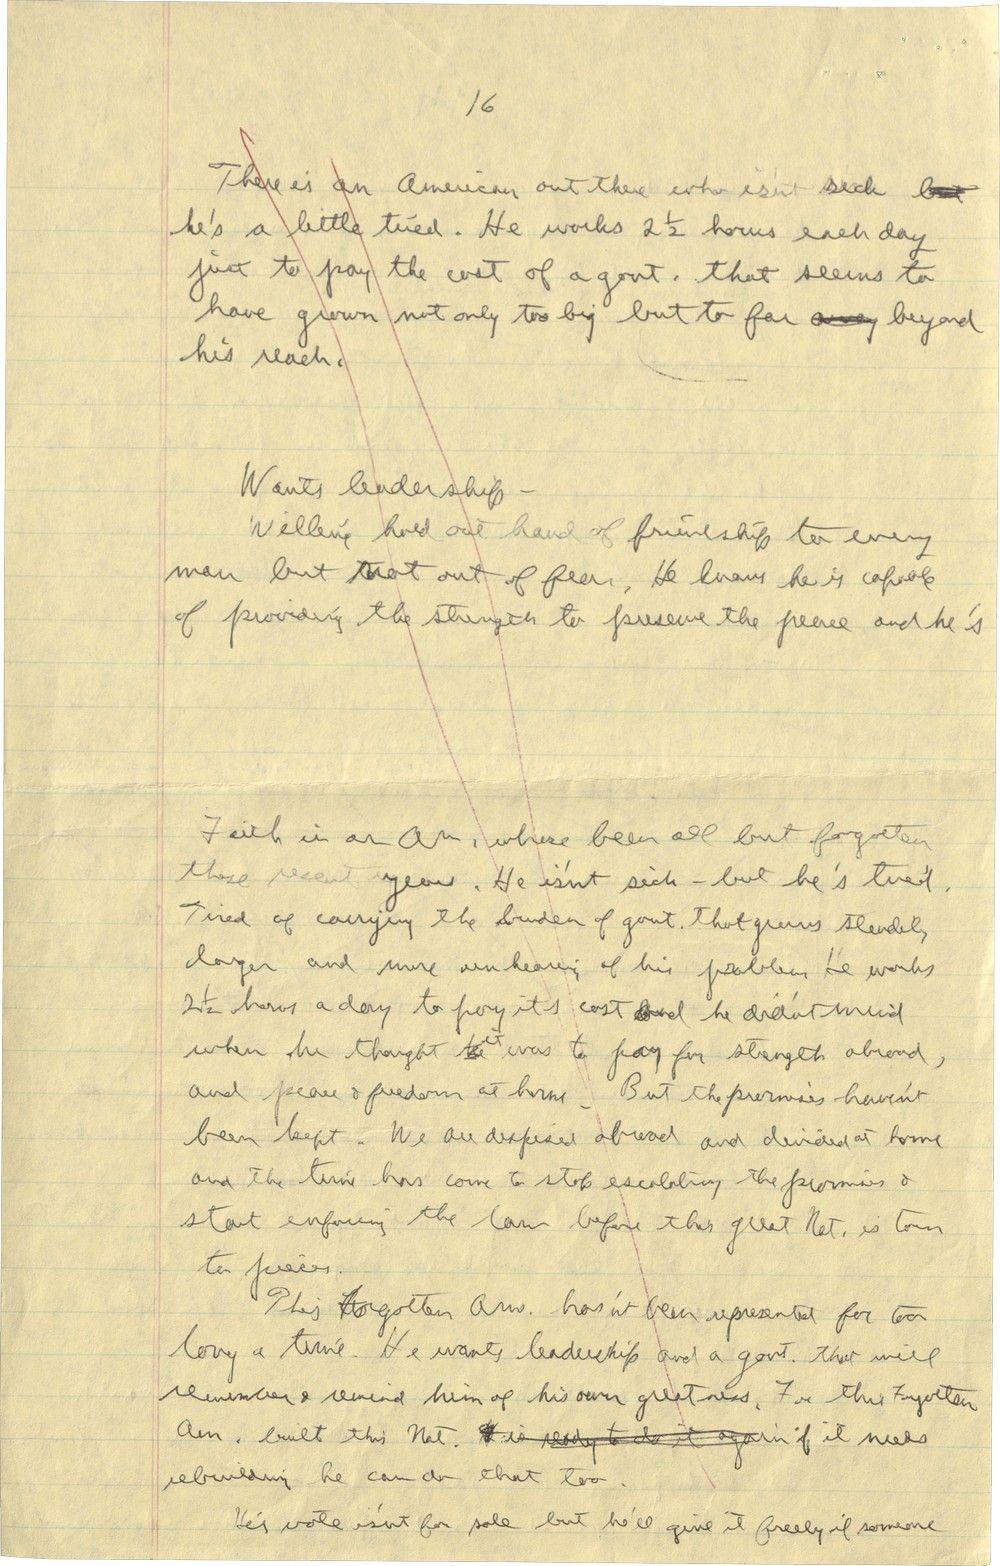 Page 16 transcript